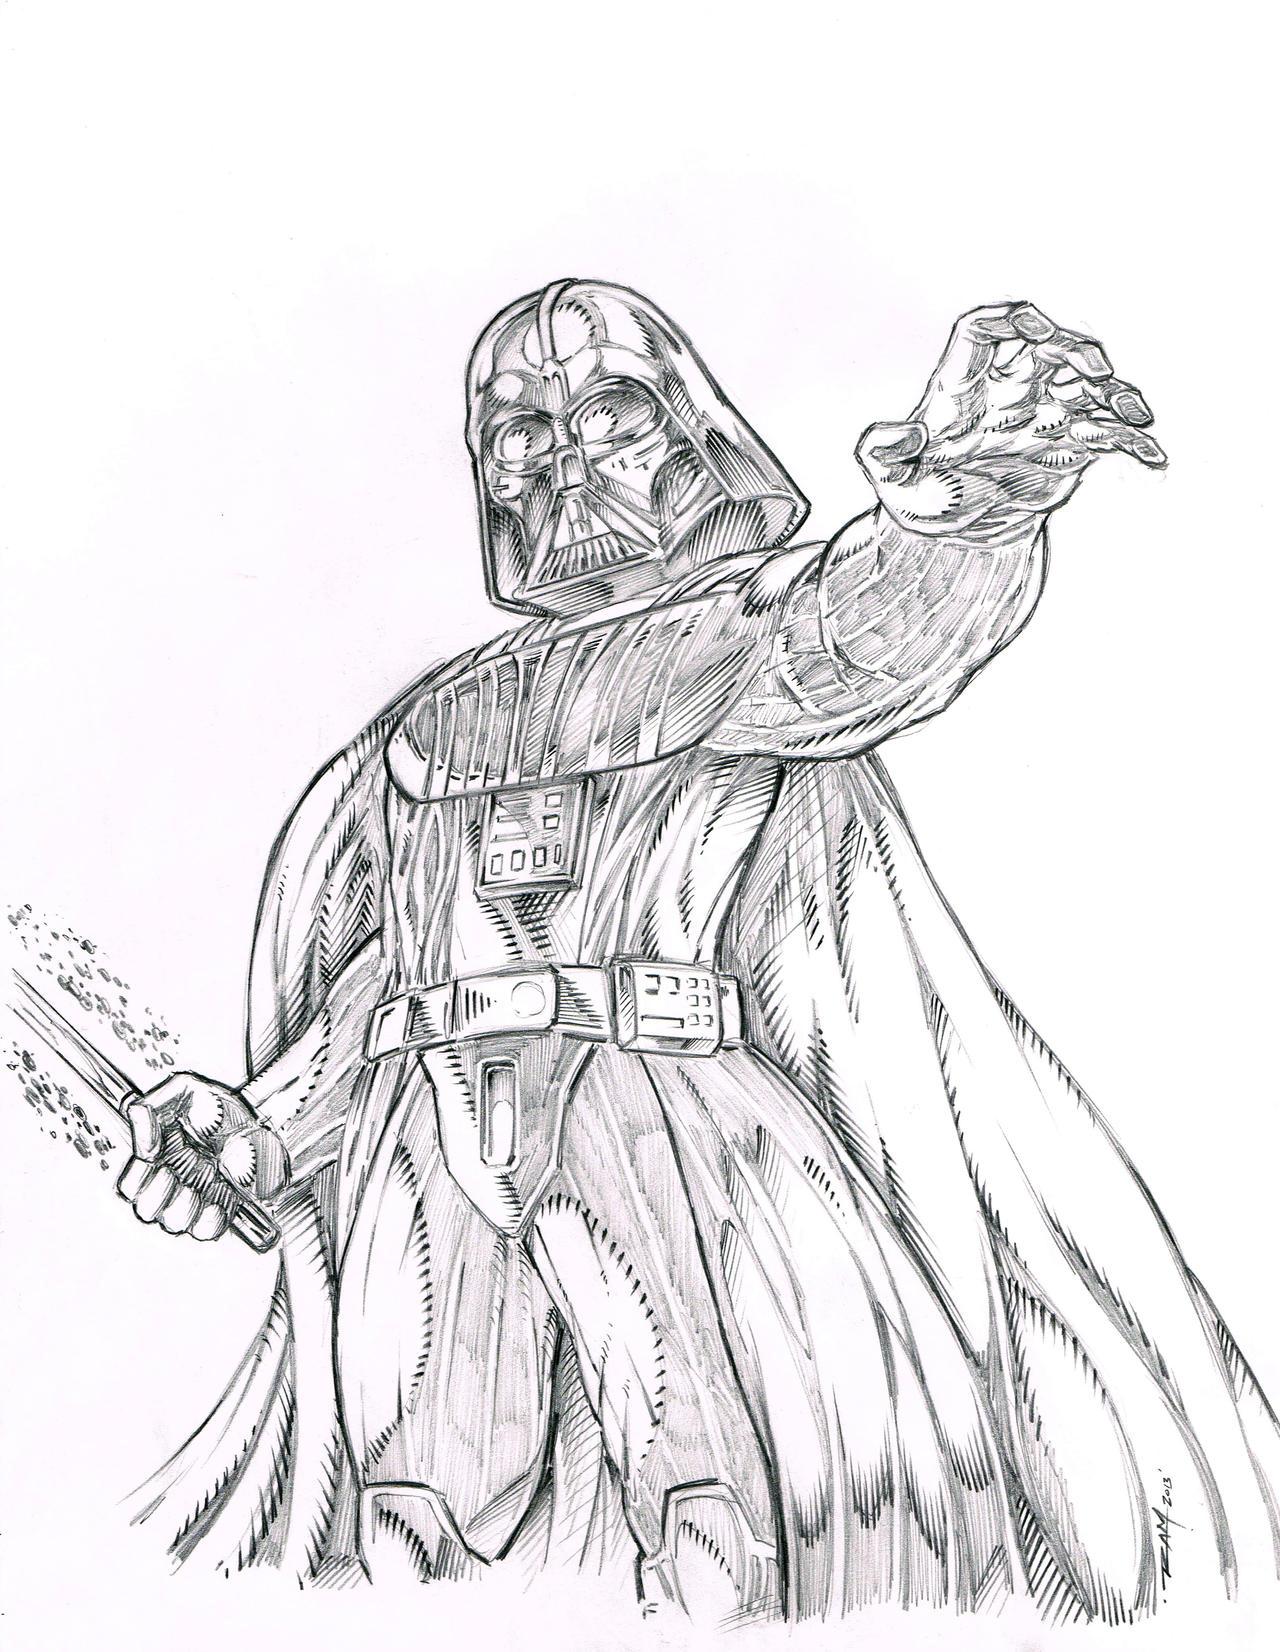 Darth Vader Sketch by Ram by robertmarzullo on DeviantArt